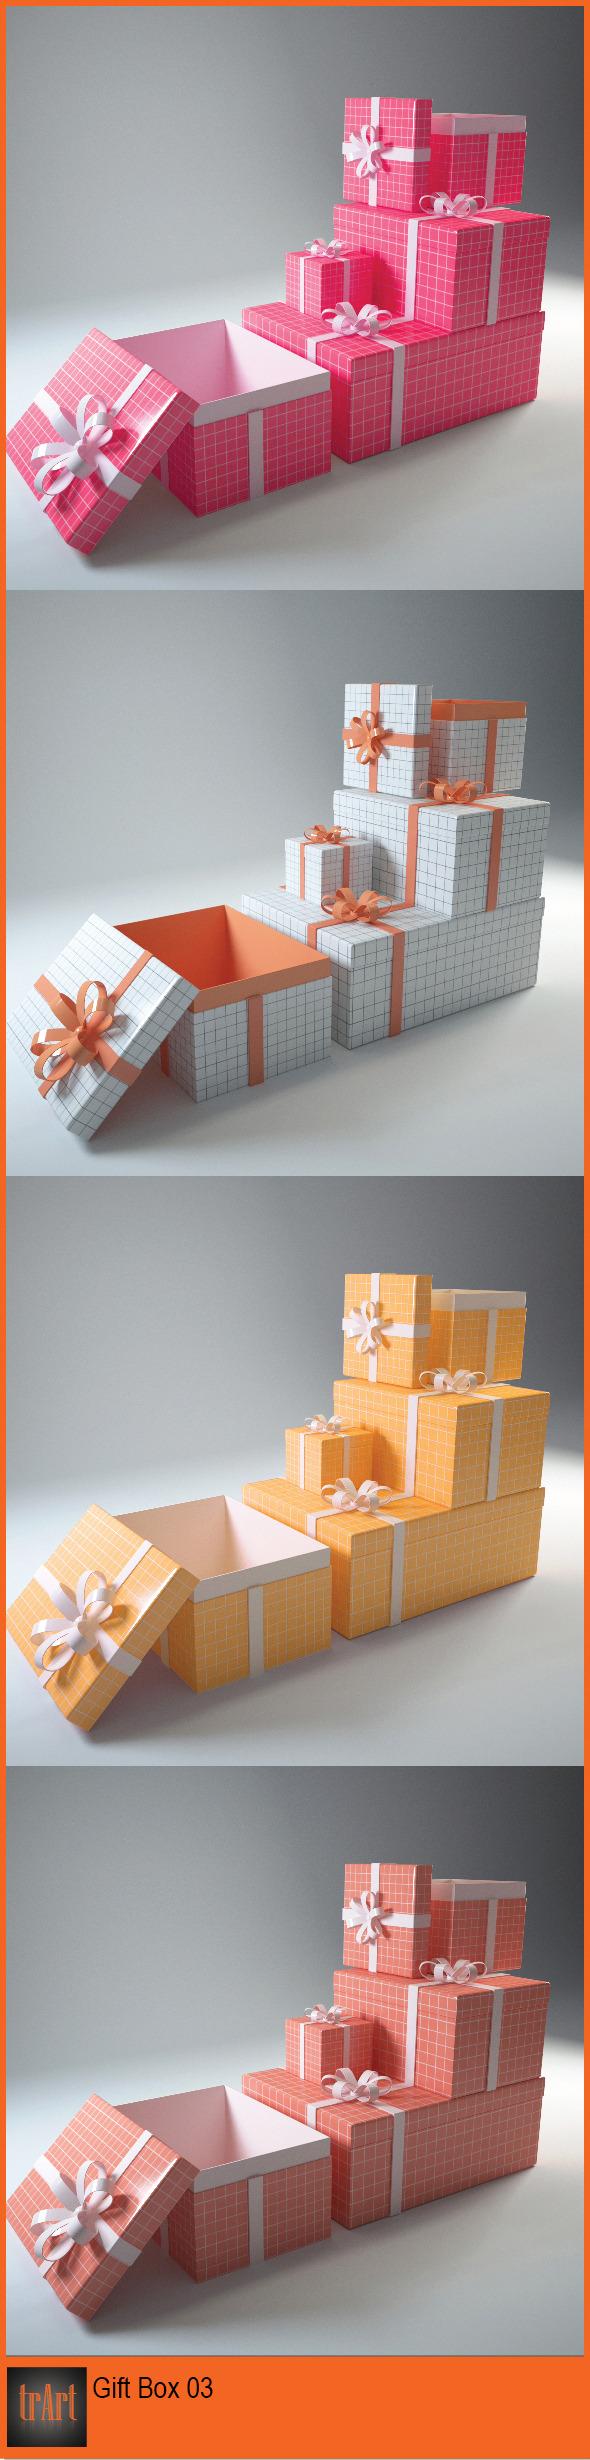 3docean gift box 6554180 3d model gift model free dmodel love holiday